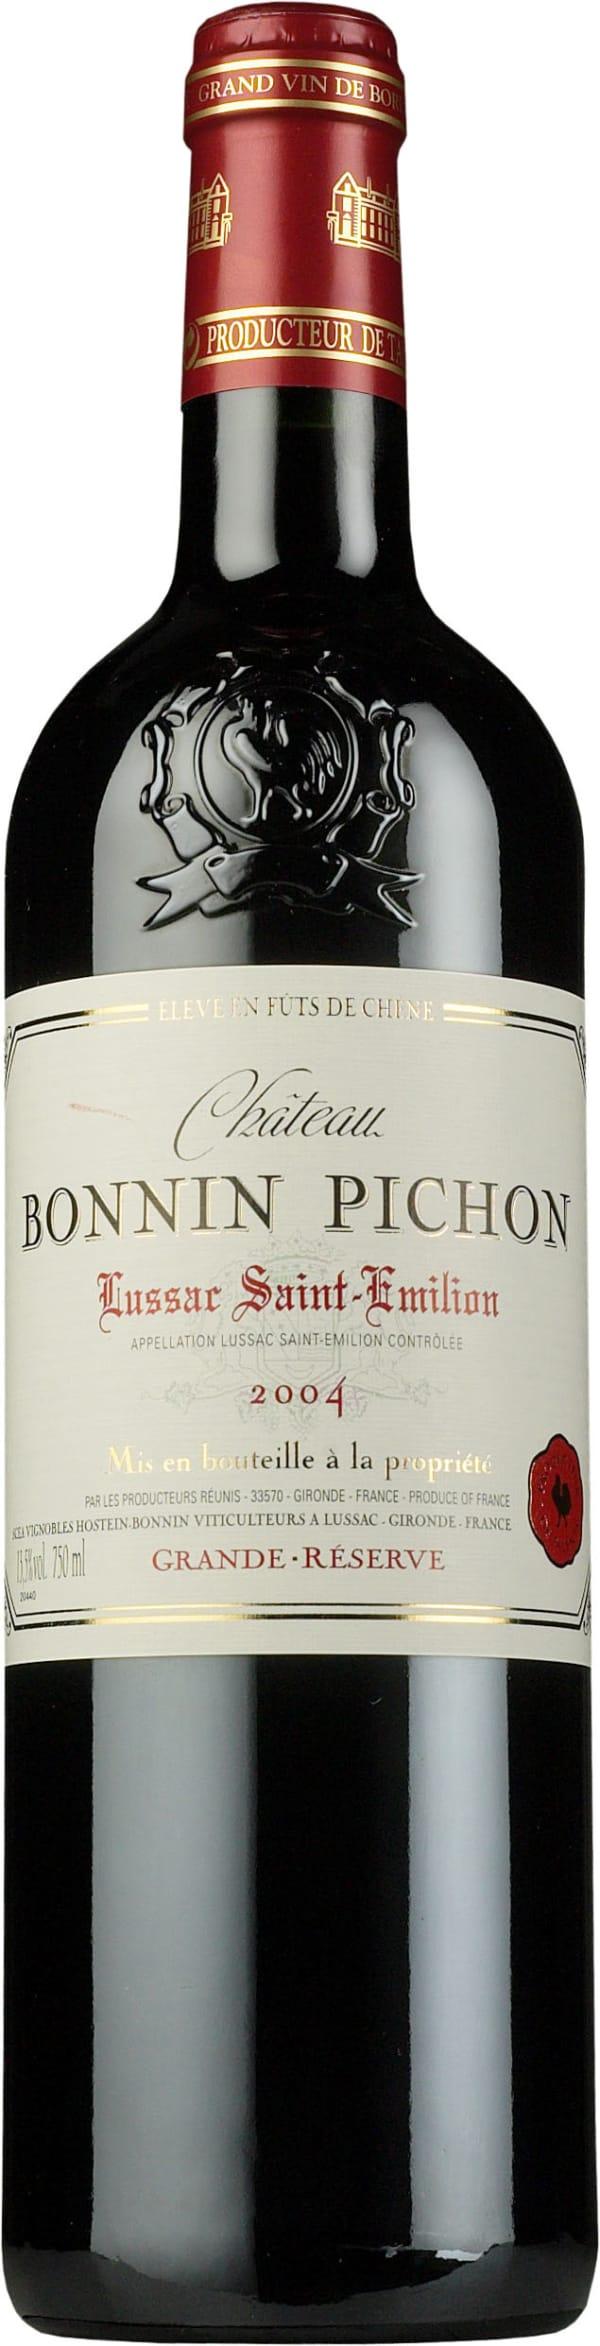 Château Bonnin Pichon 2012